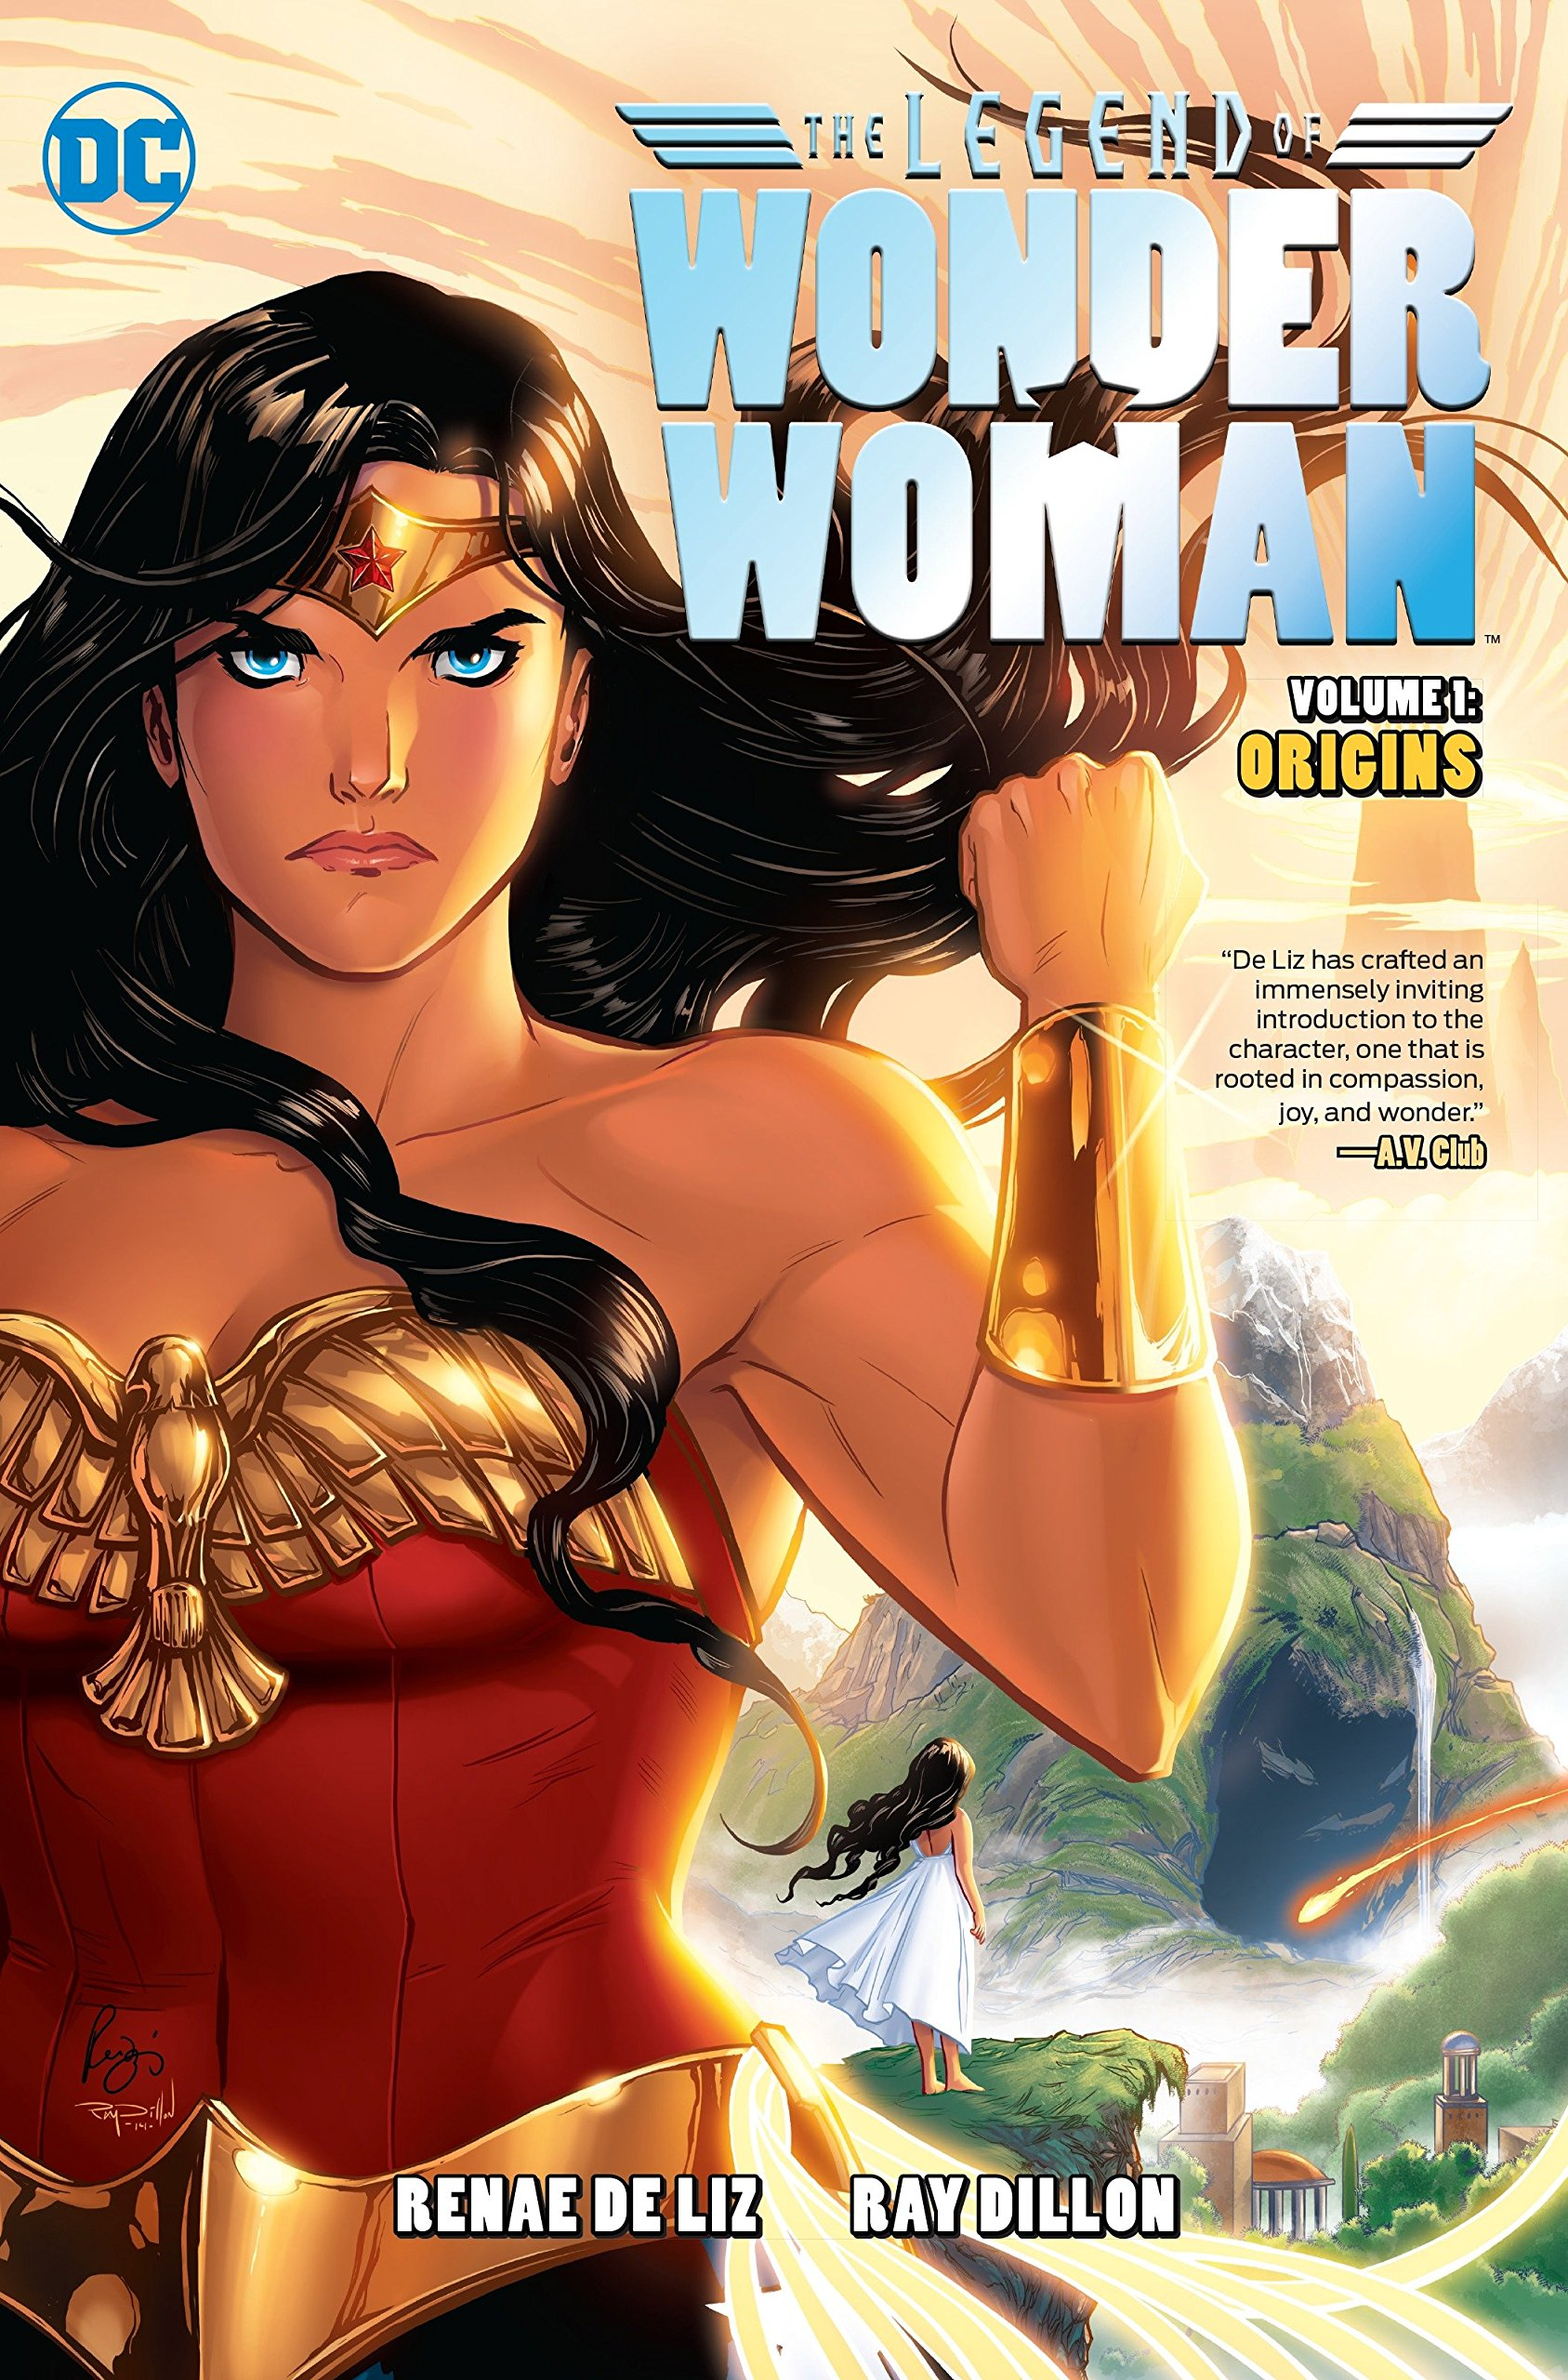 Read Online The Legend of Wonder Woman Vol. 1: Origins ebook